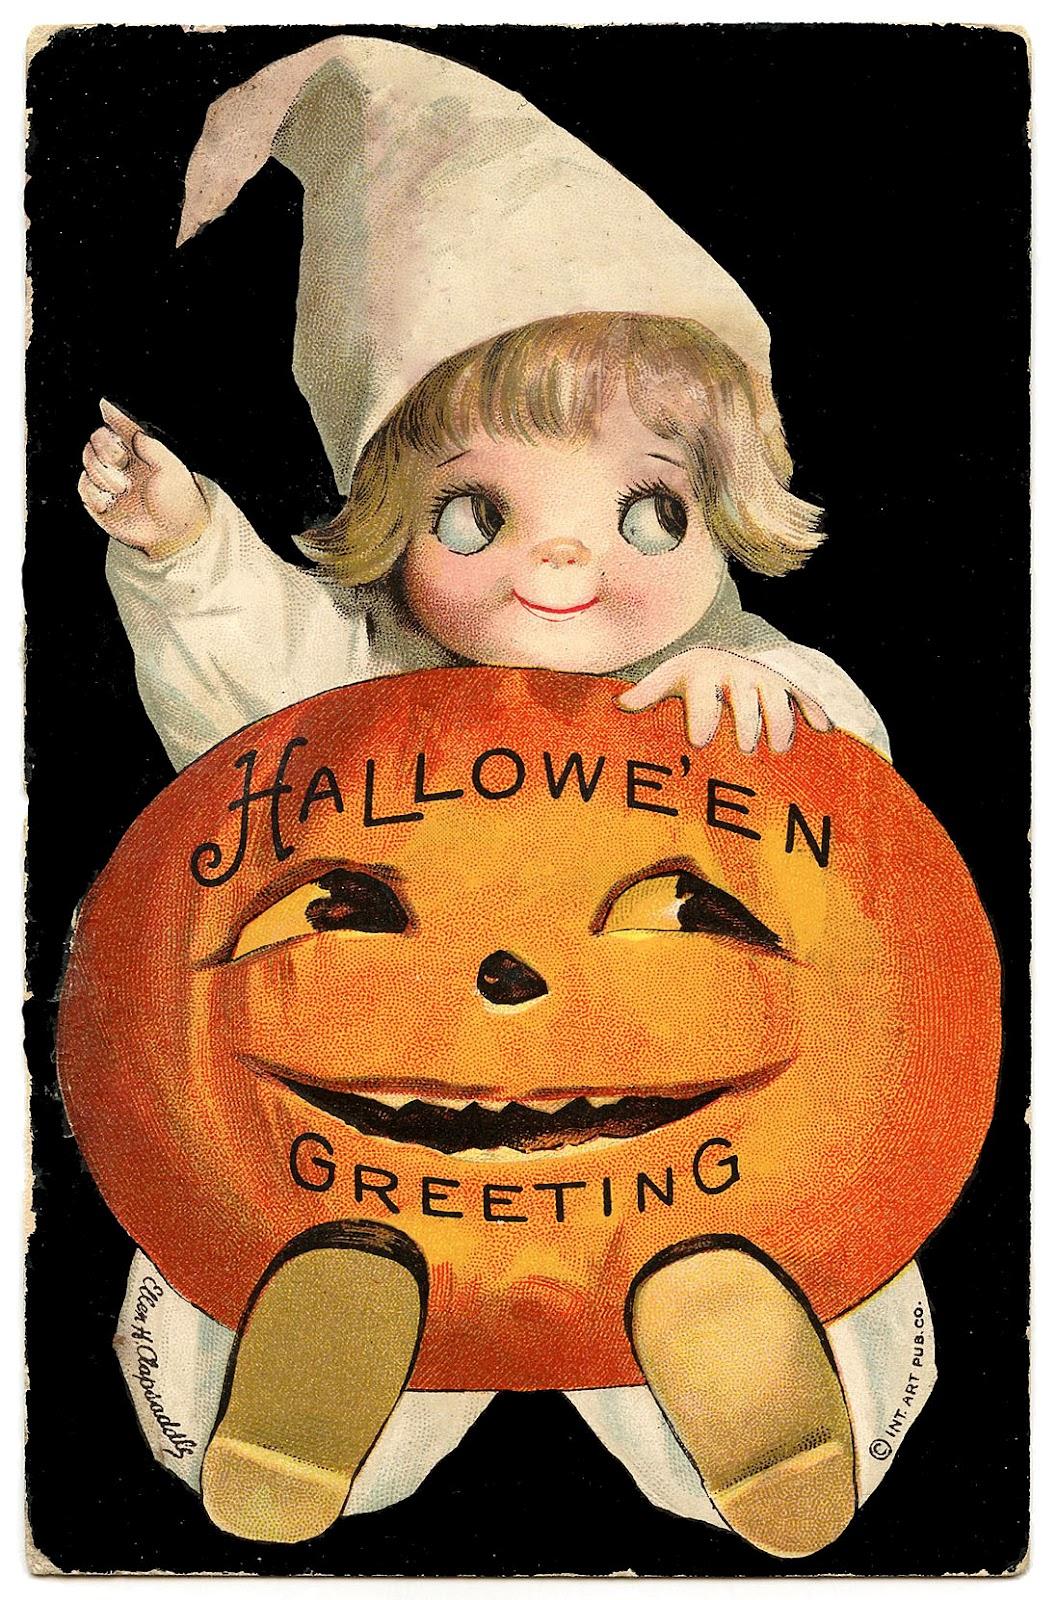 Vintage Halloween Clip Art U2013 Googly -Vintage Halloween Clip Art u2013 Googly Eye Pumpkin Girl-13